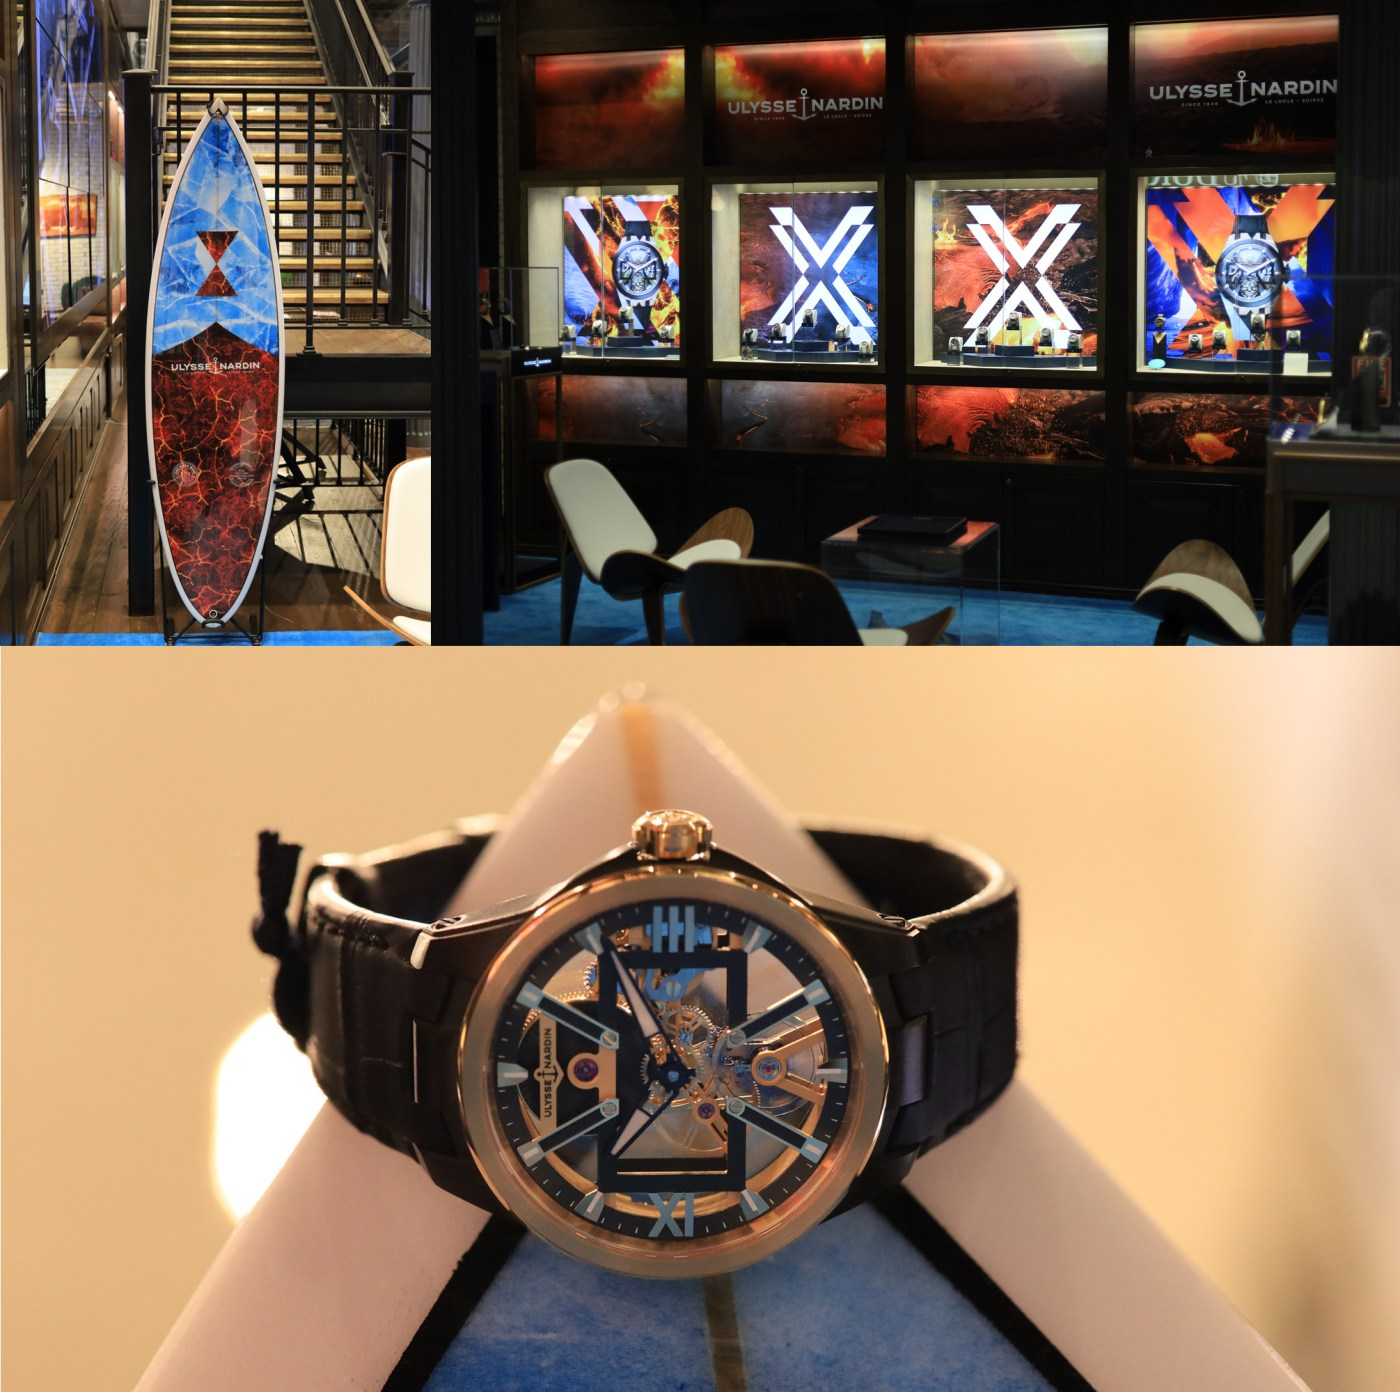 Ulysse Nardin Pop-Up at Watches of Switzerland SoHo